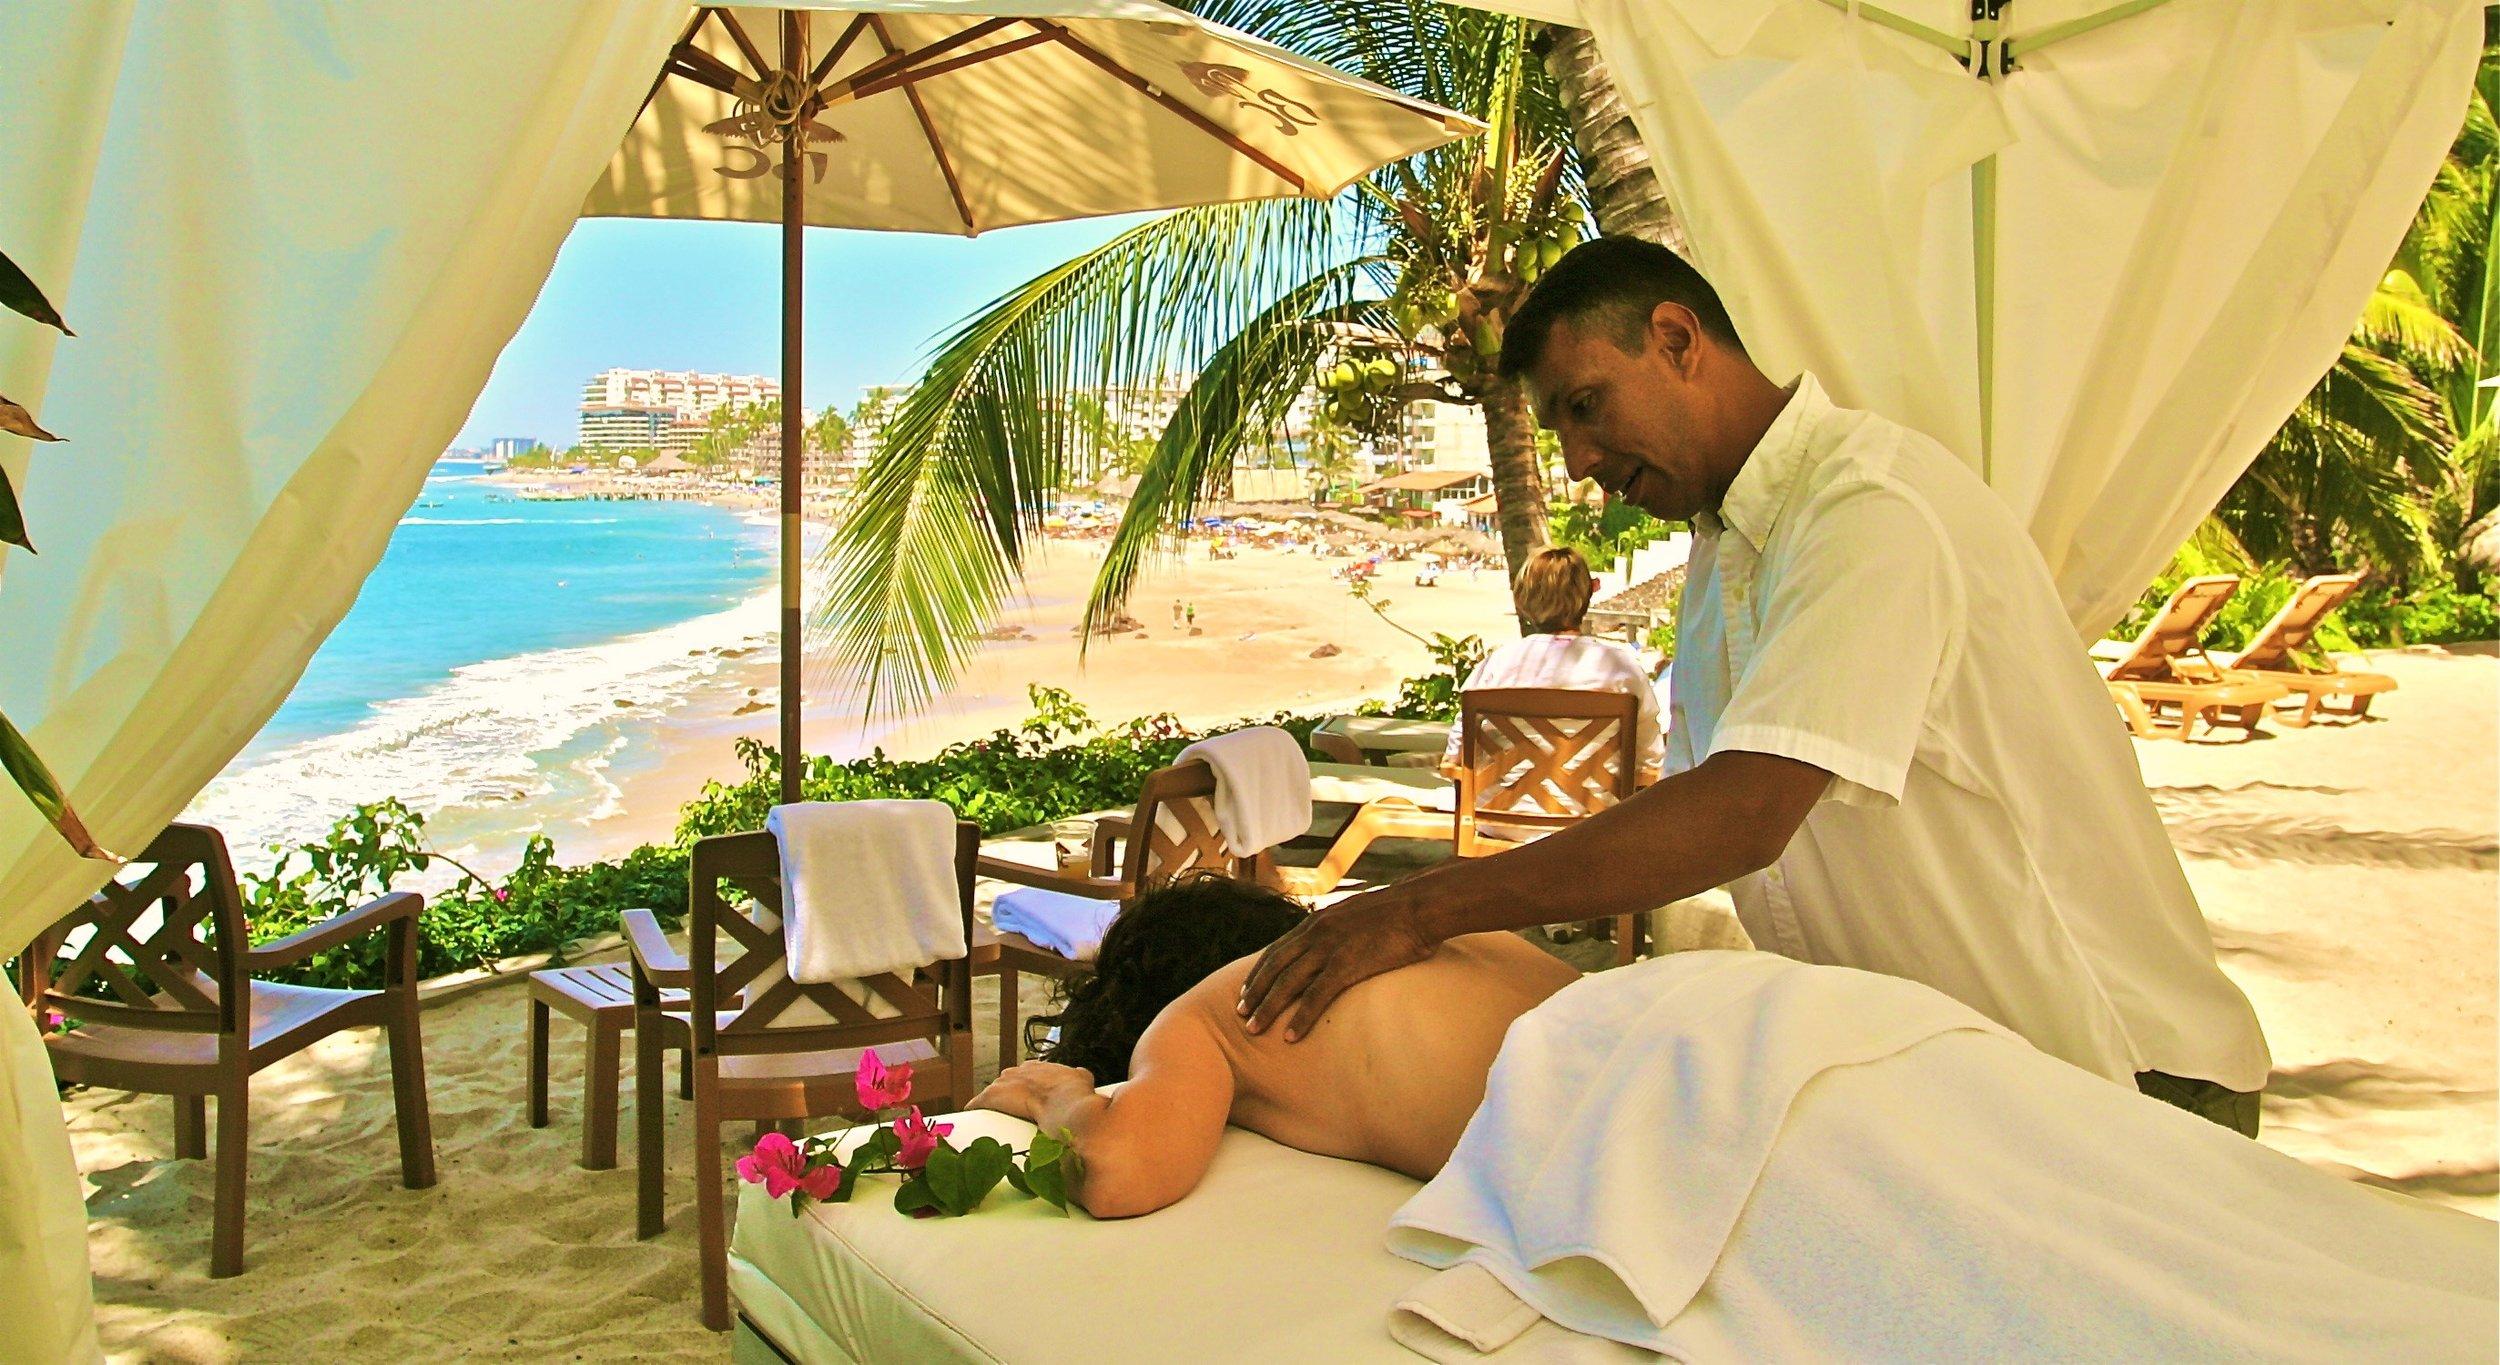 Vacation Vallarta Beachouse Spa Services